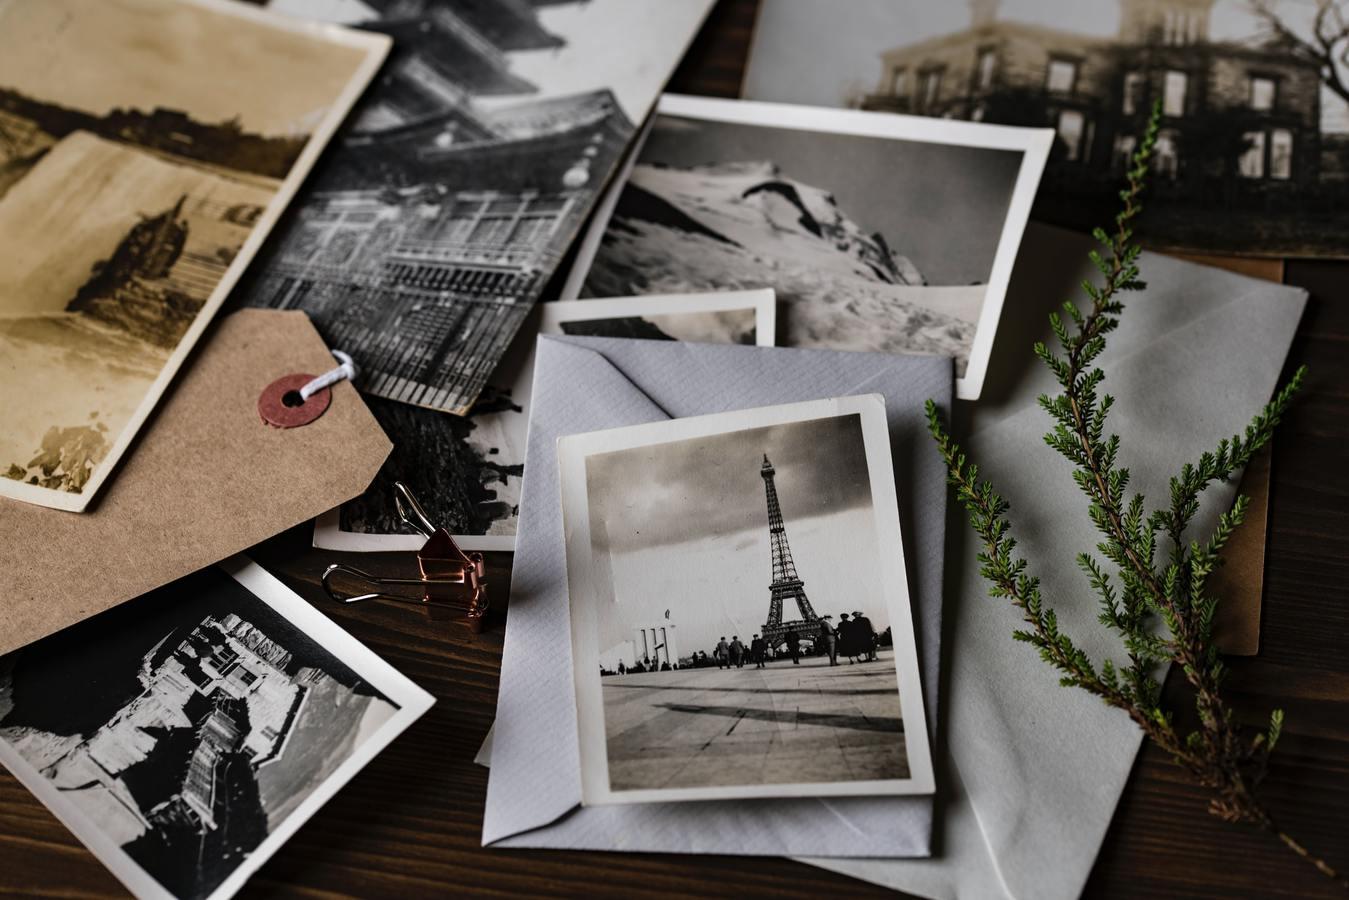 Pocztówki na stole